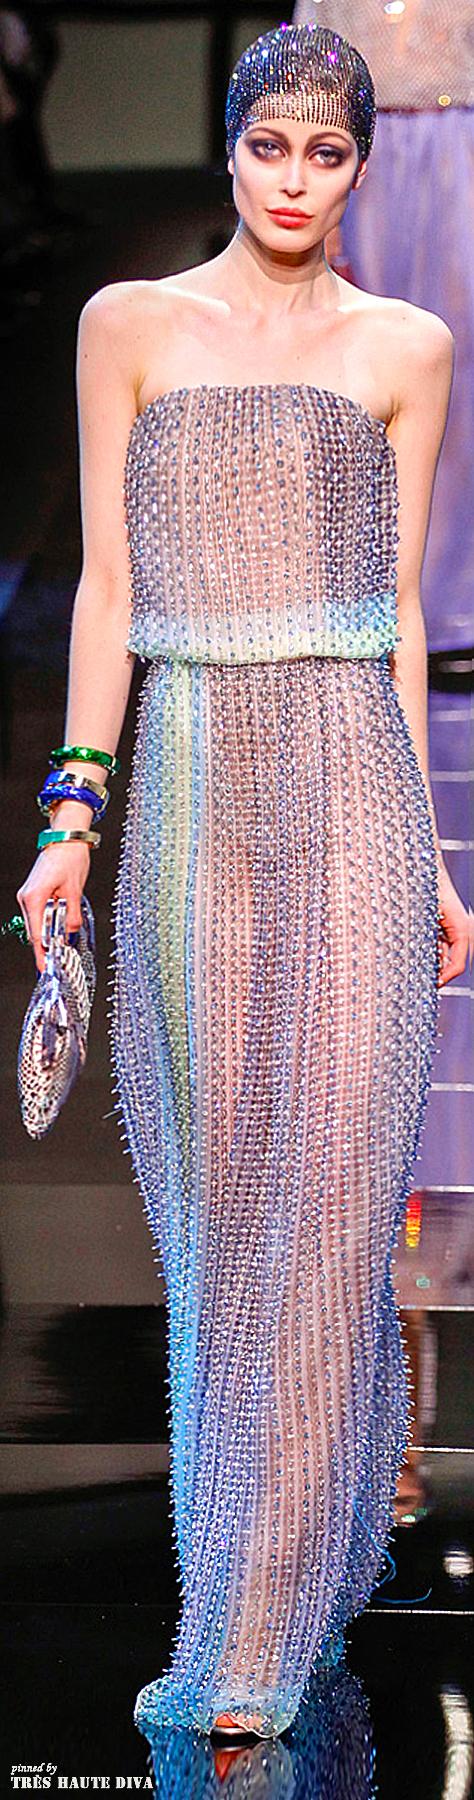 Giorgio Armani Privé Couture Spring 2014   Moda y diseño   Pinterest ...